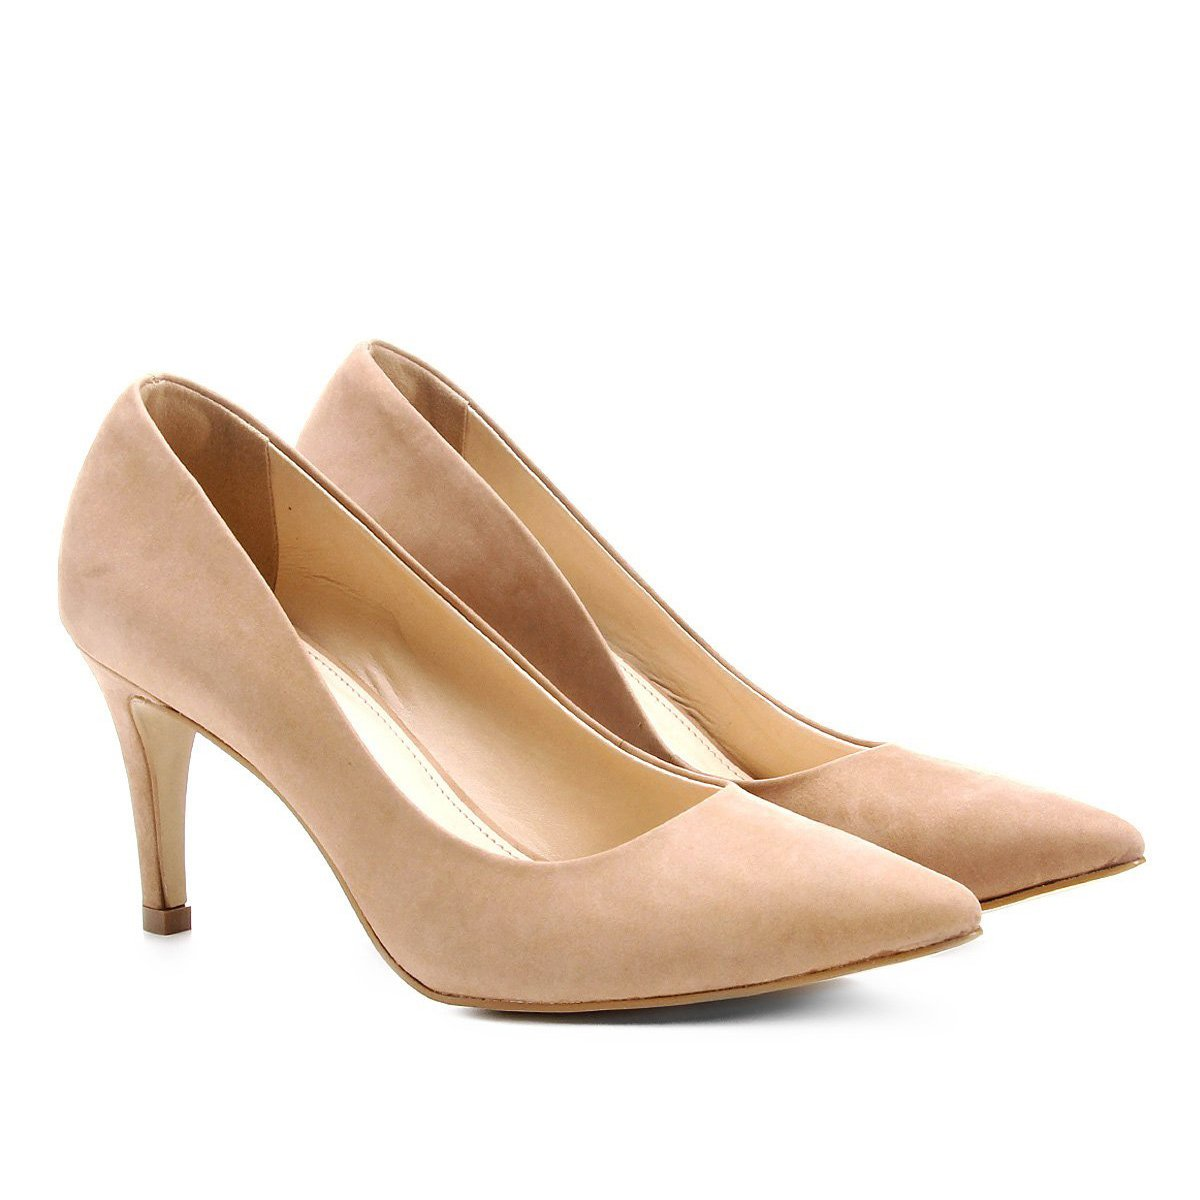 3f175039d Scarpin Couro Shoestock Salto Médio | Shoestock